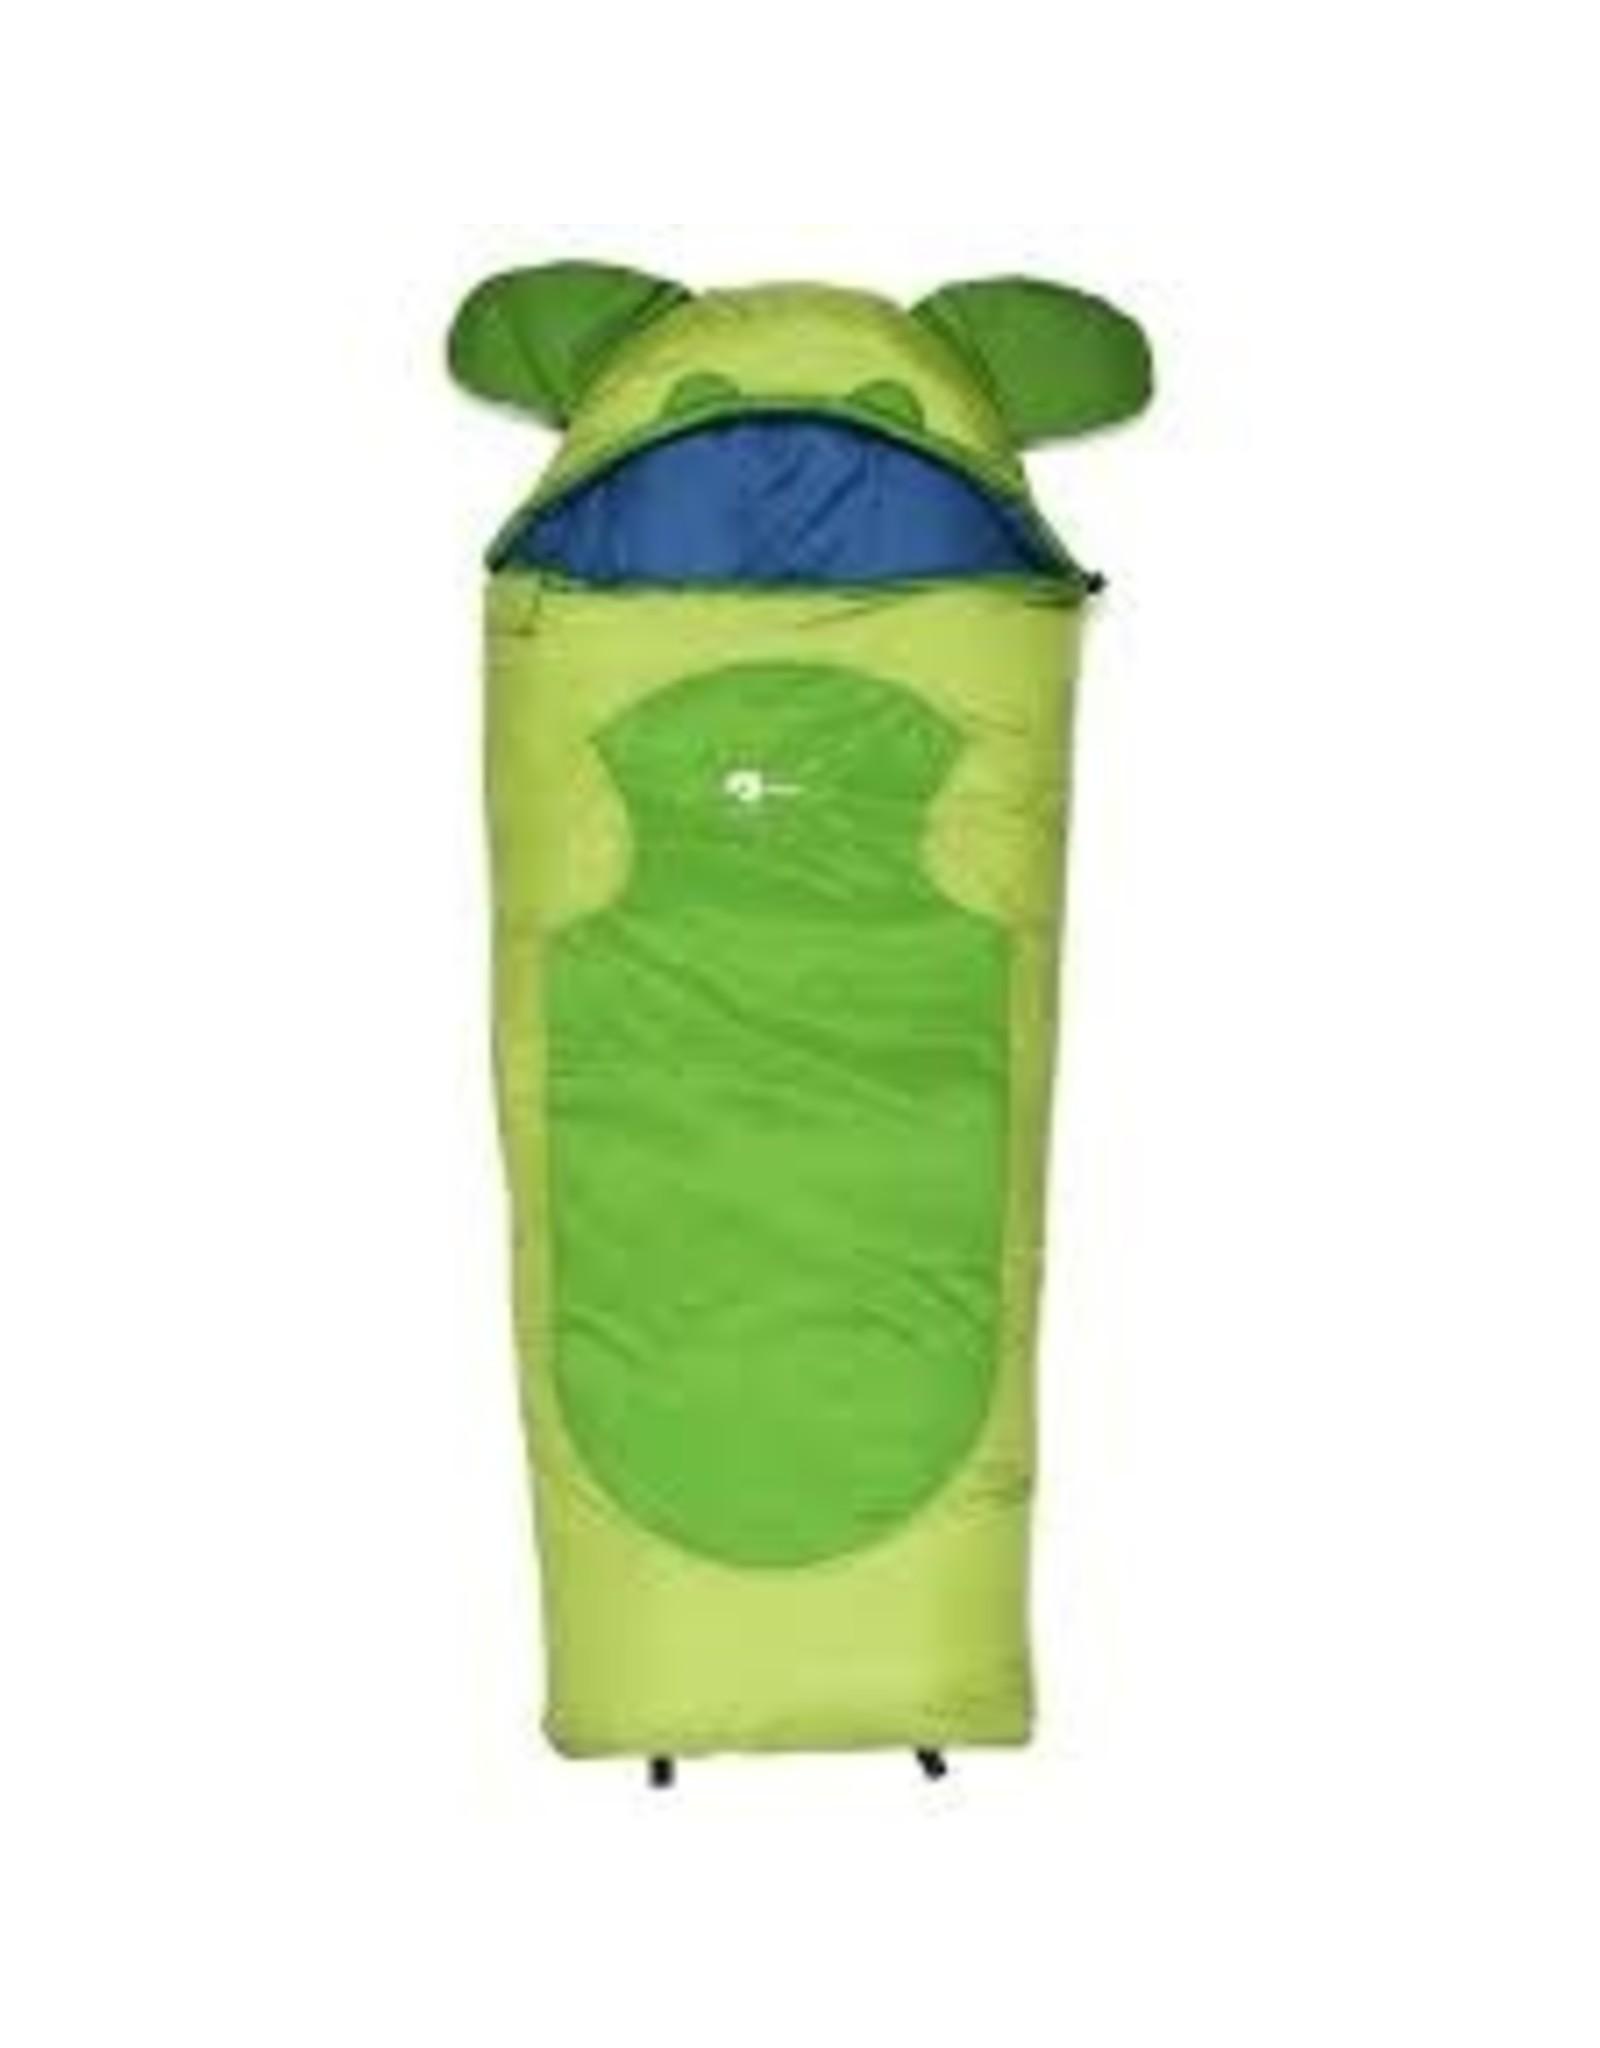 Chinook Chinook Cubs Sleeping Bag -Green